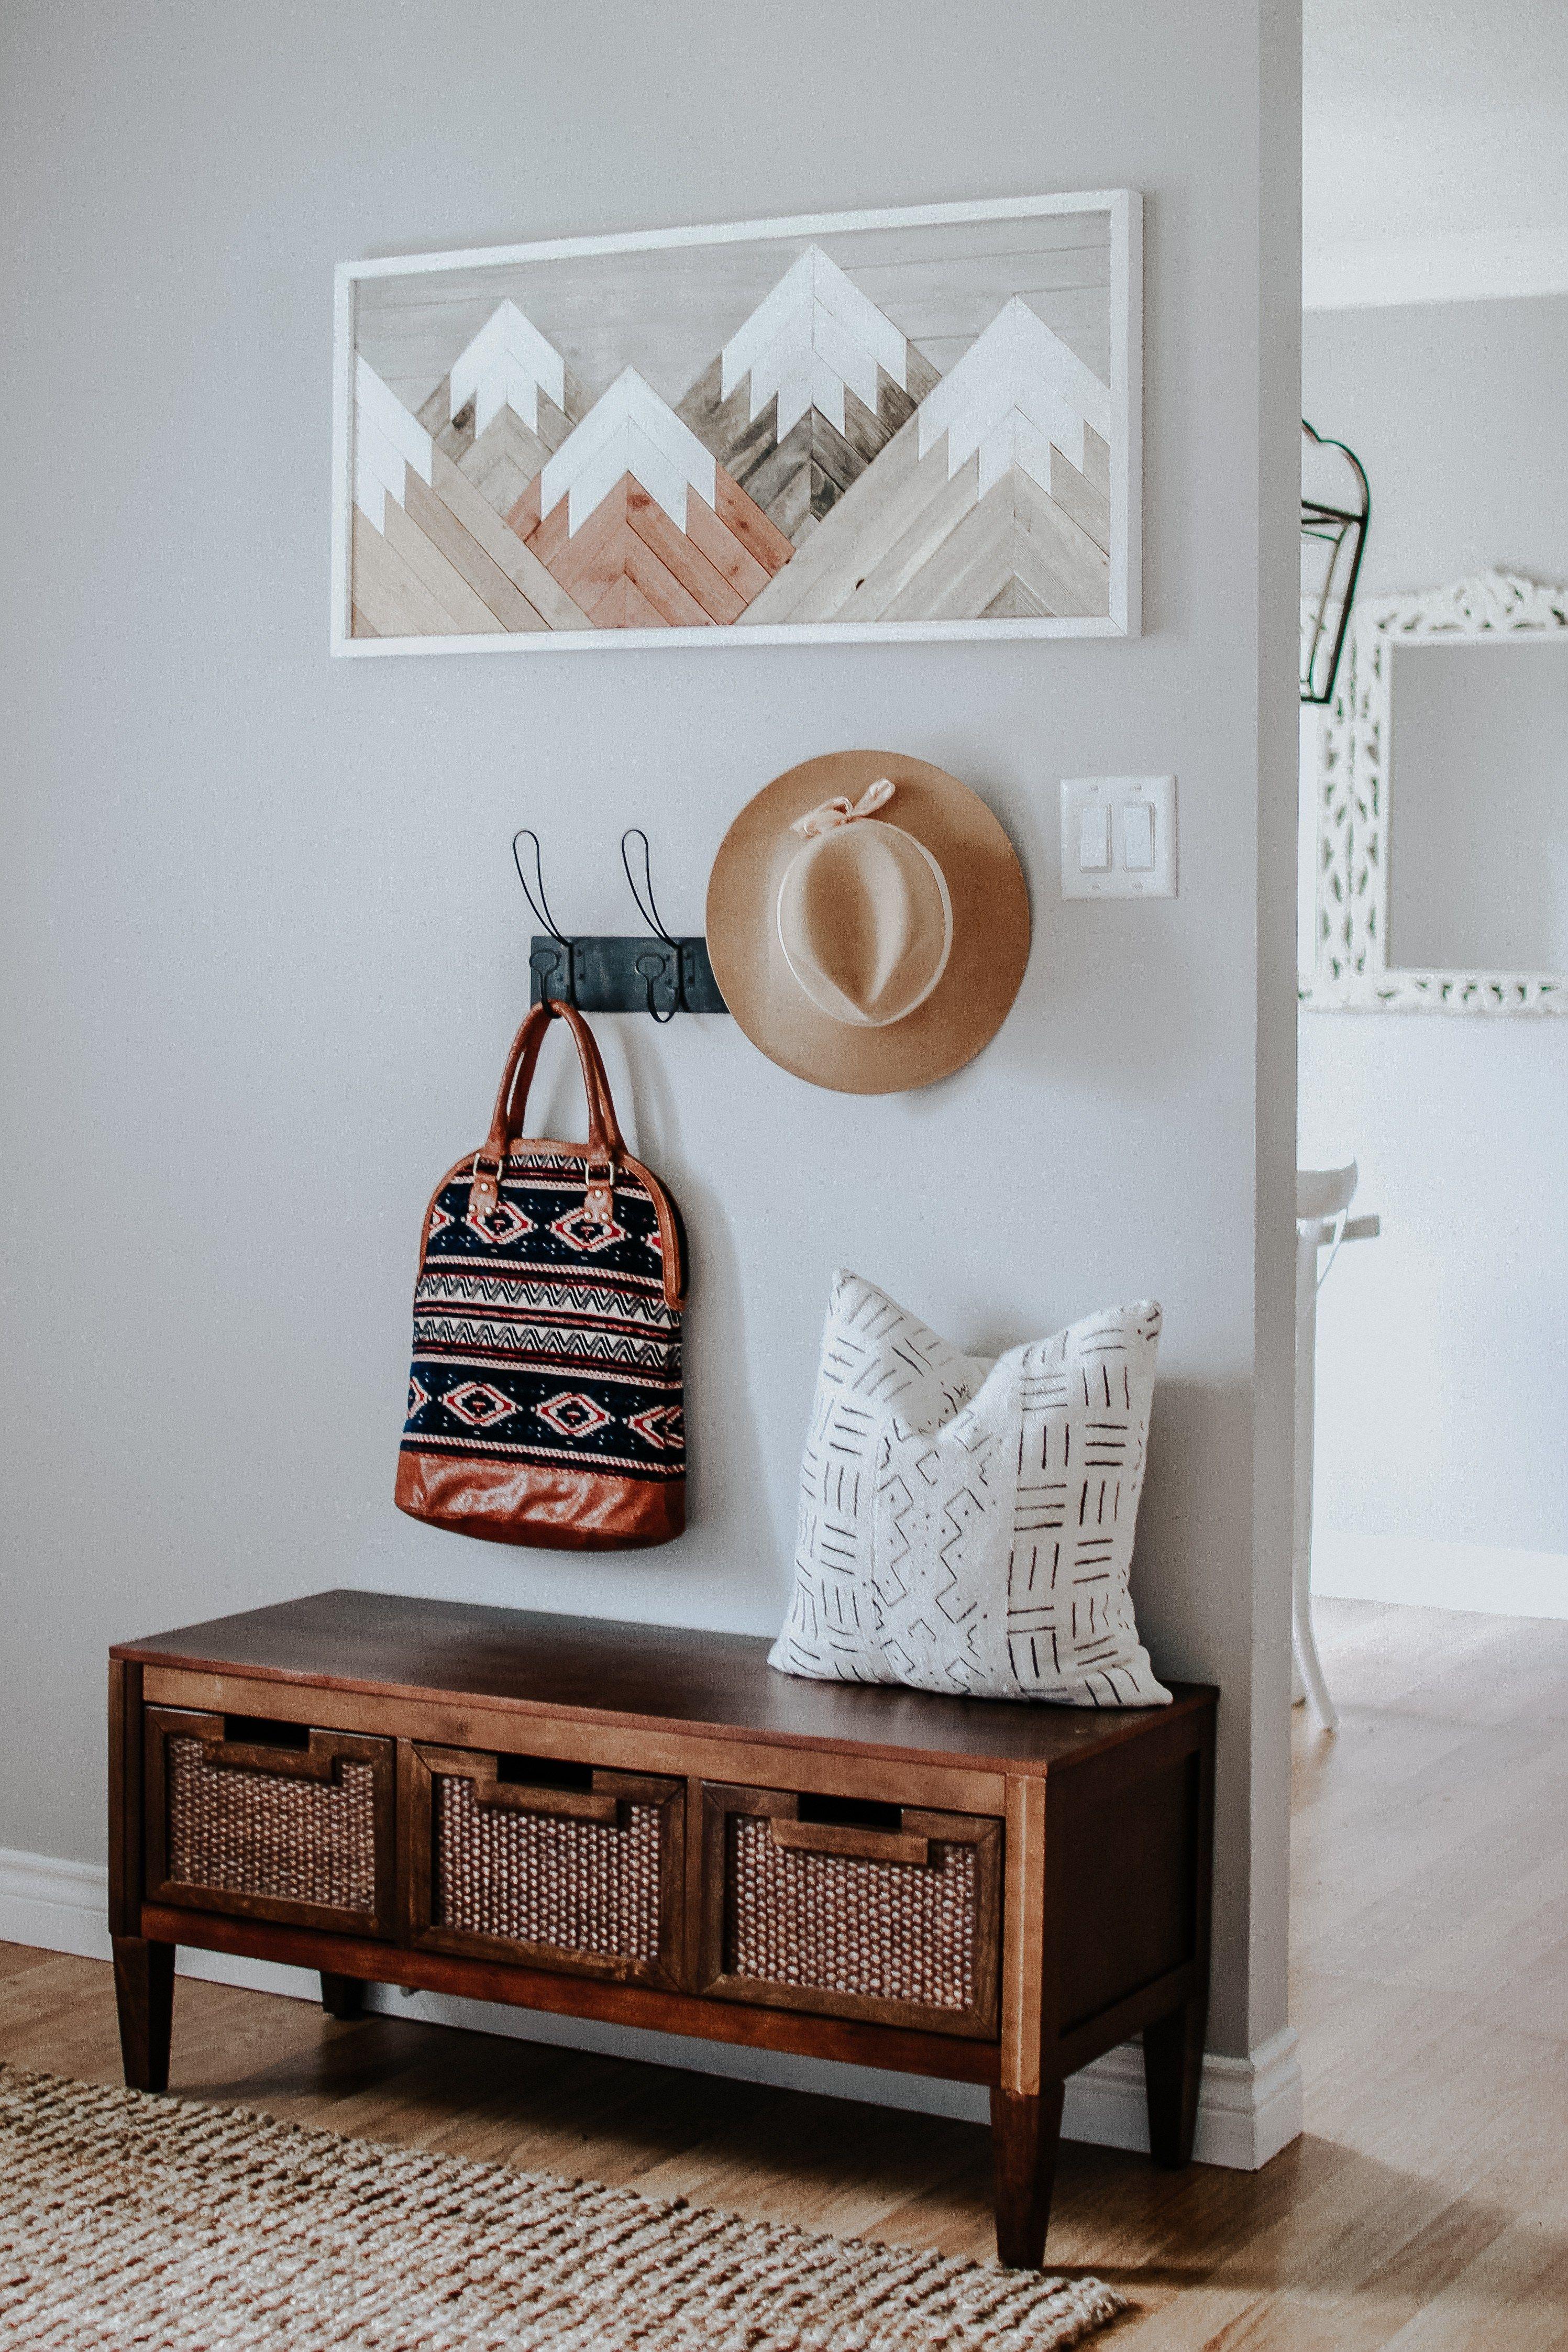 CANVAS Room Refresh With Canadian Tire - Jessica Sara Morris   Canadian  decor, Room decor, Decor